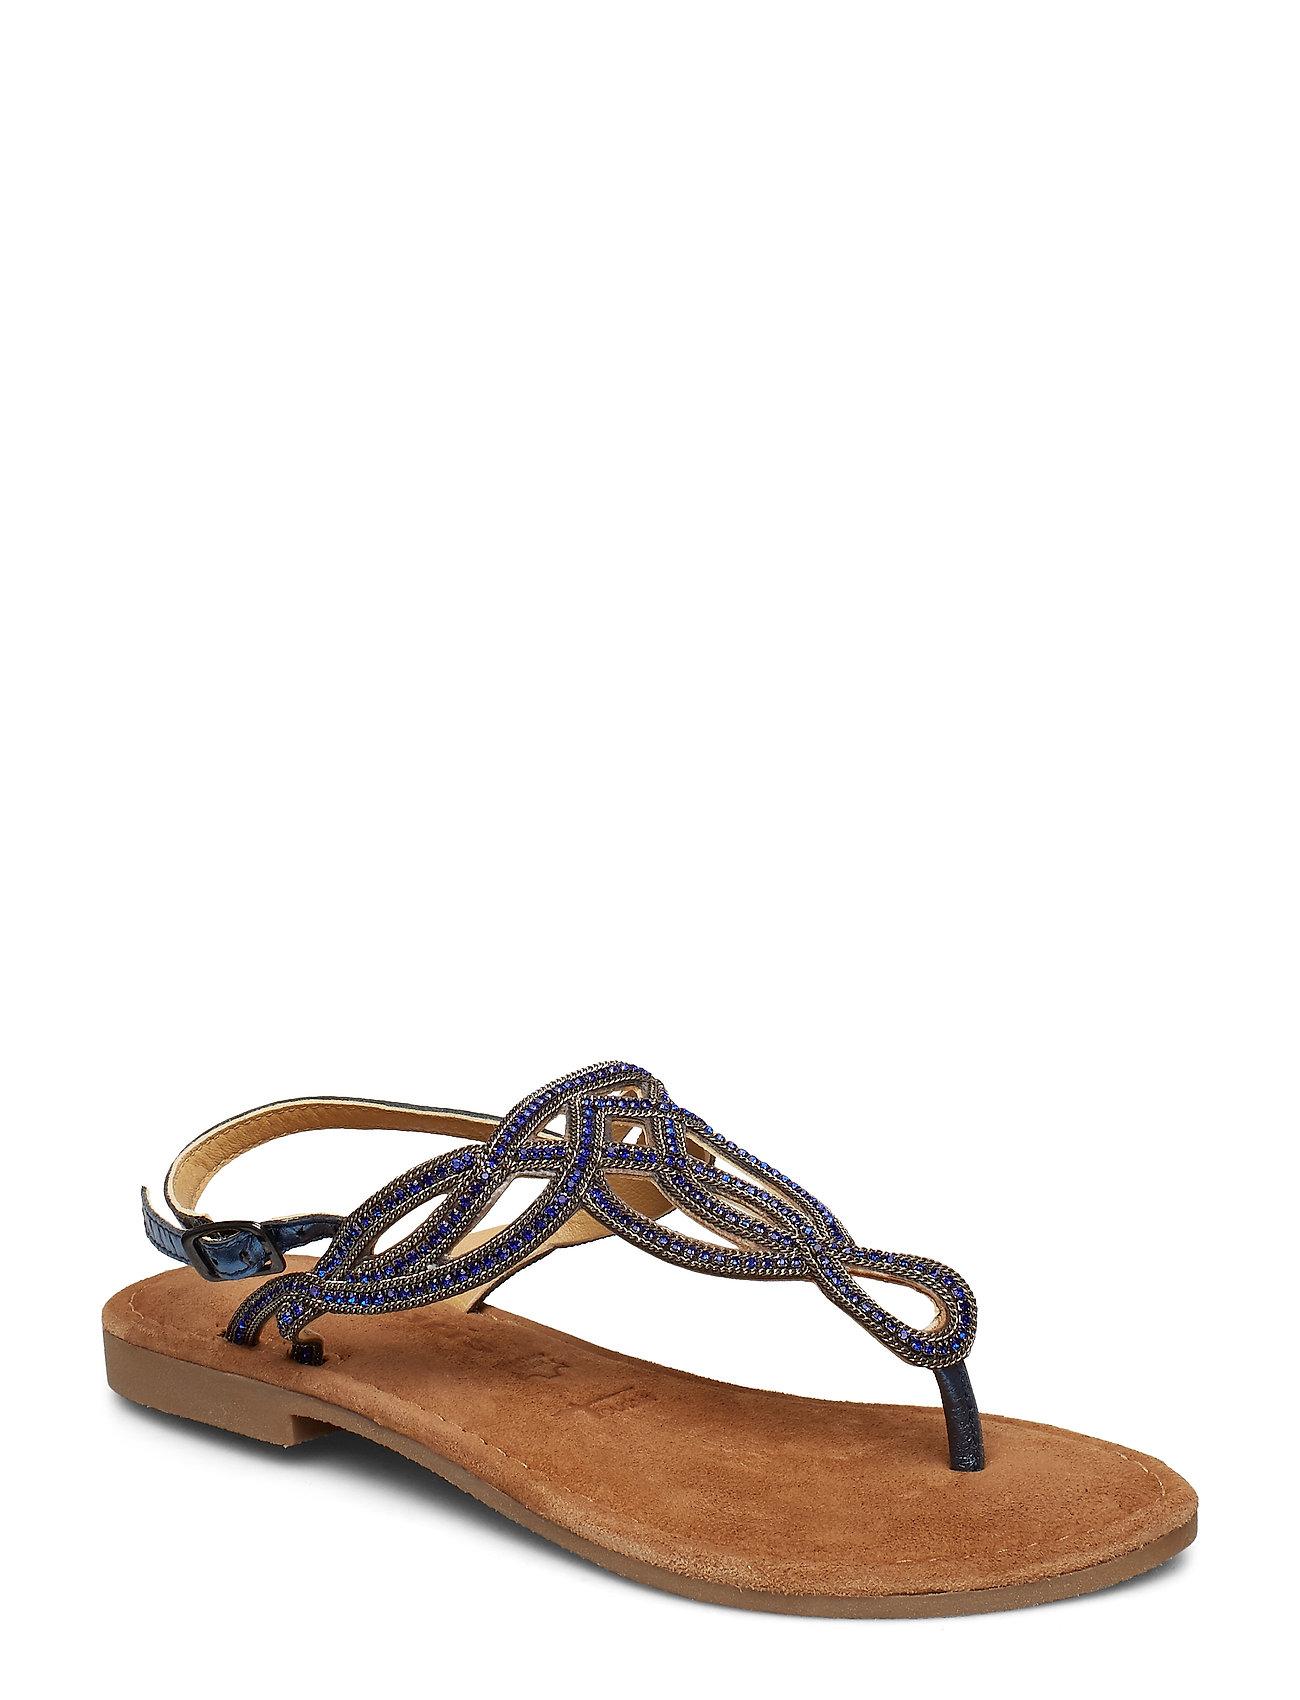 Tamaris Sandals - BLUE METALLIC